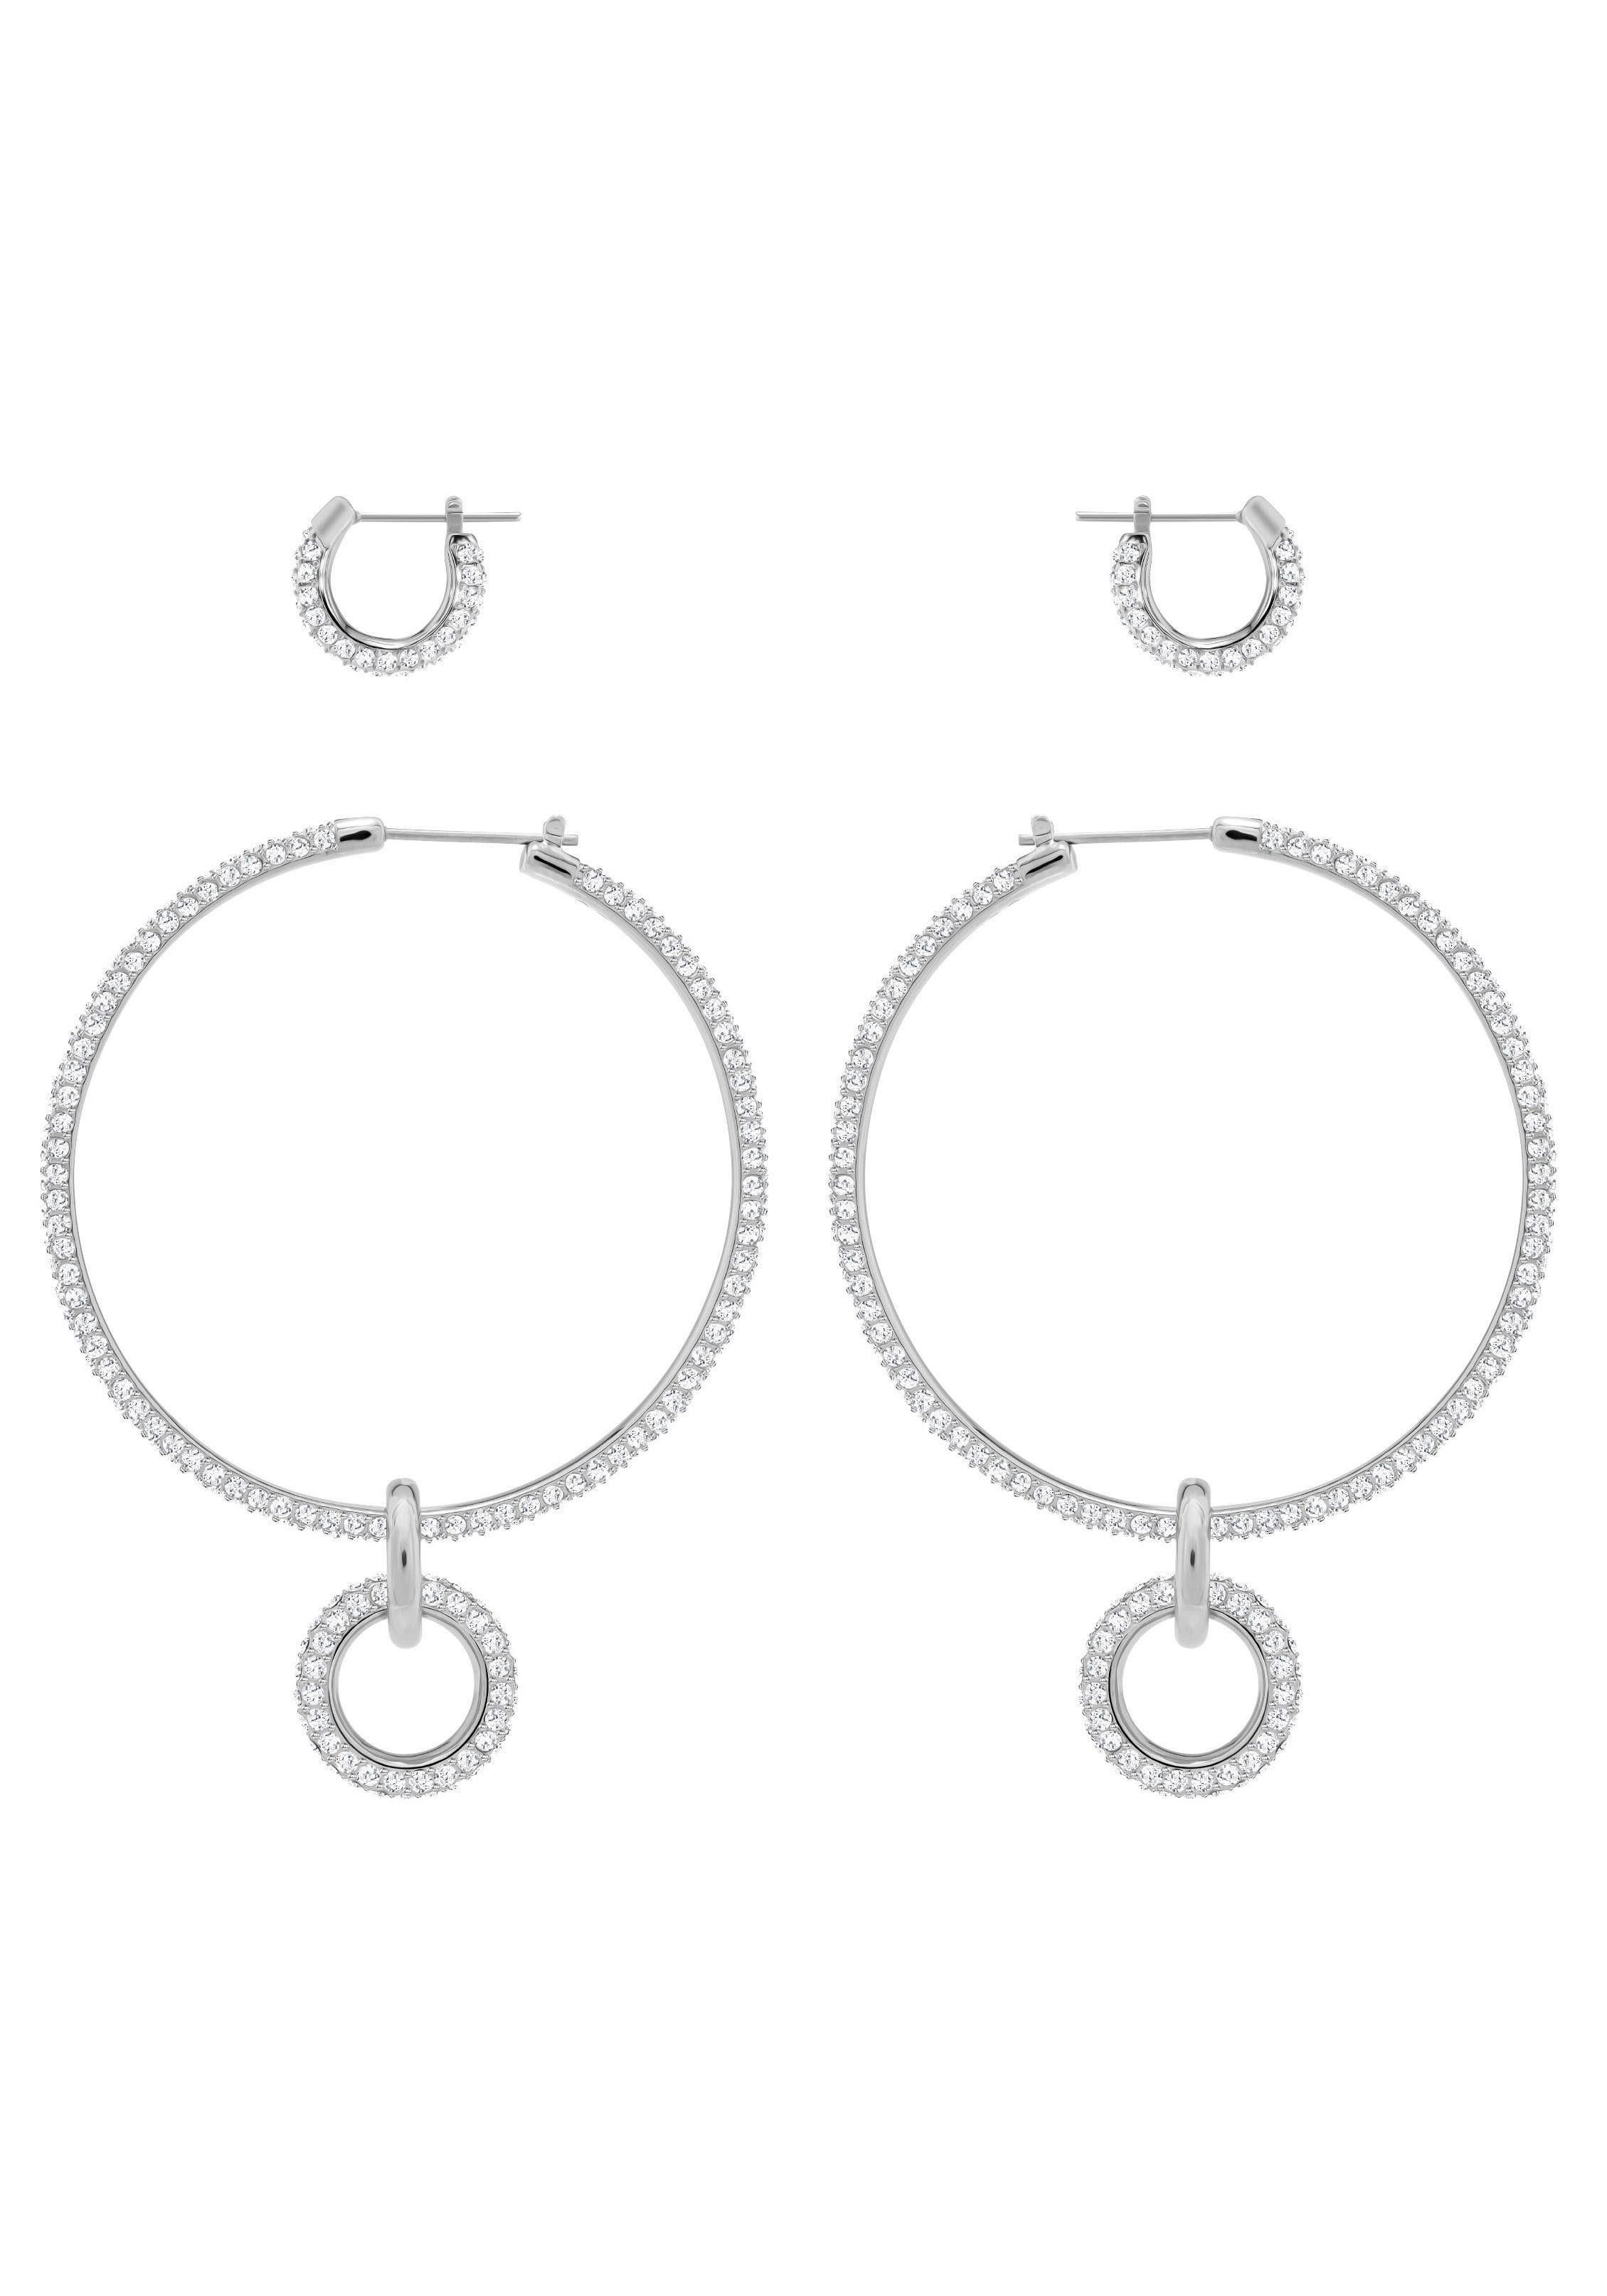 Swarovski Ohrring-Set »Stone Ohrringset, weiss, rhodiniert, 5437971« (Set, 6 tlg) mit Swarovski® Kristallen